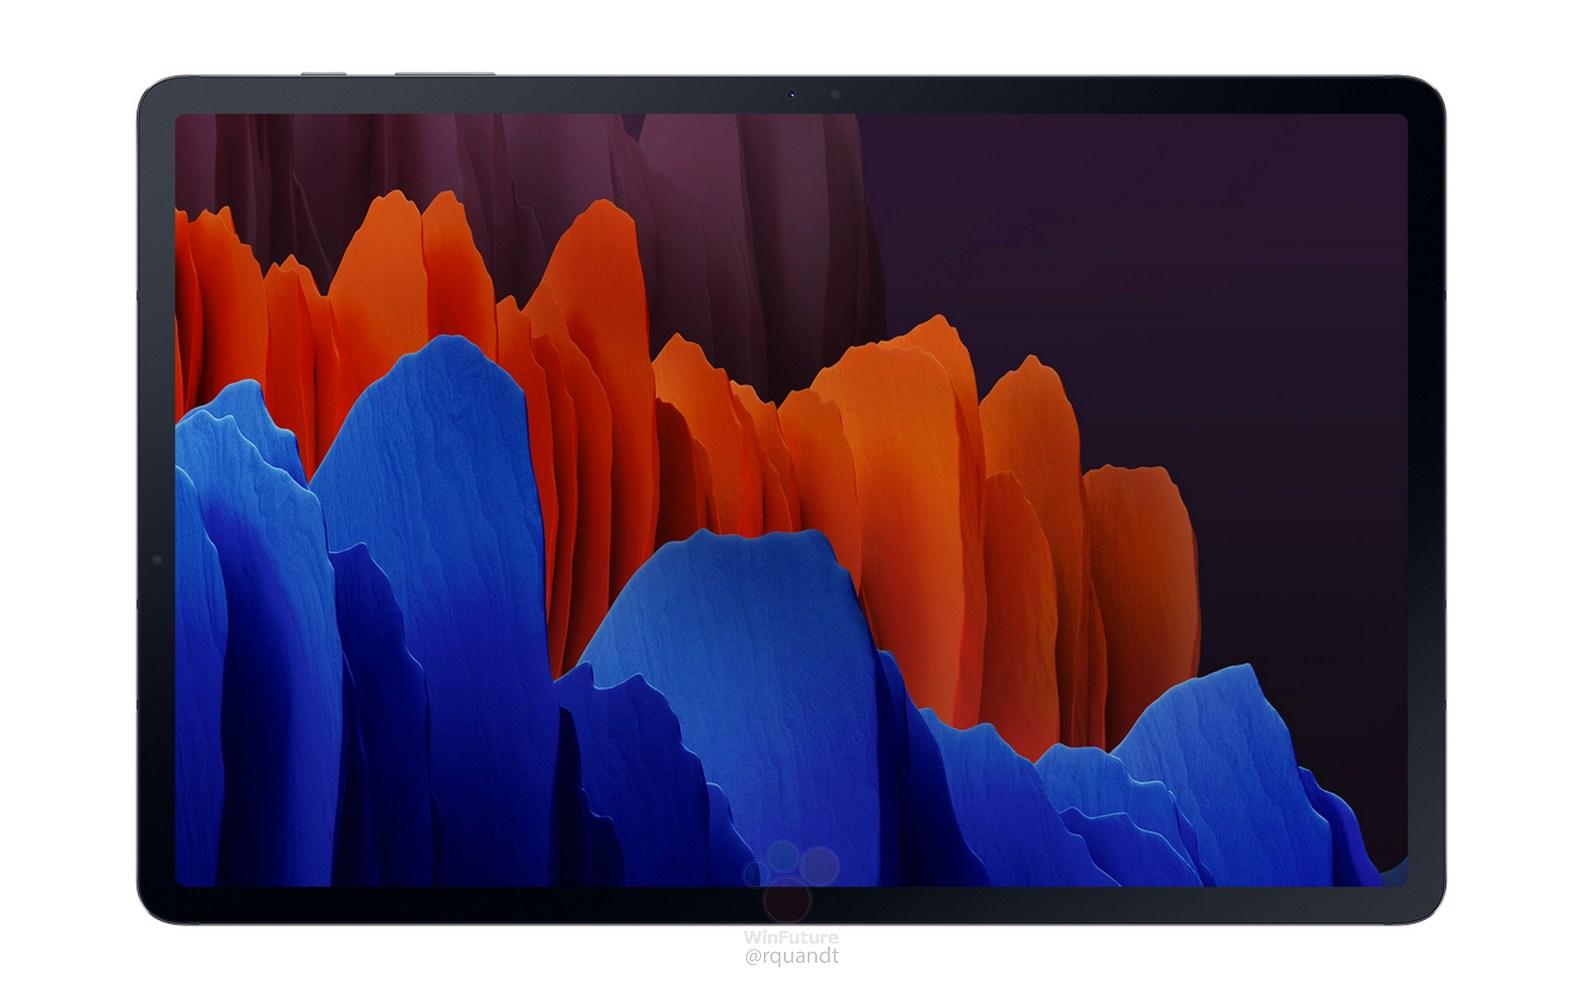 Samsung Galaxy Tab S7 Plus tablet